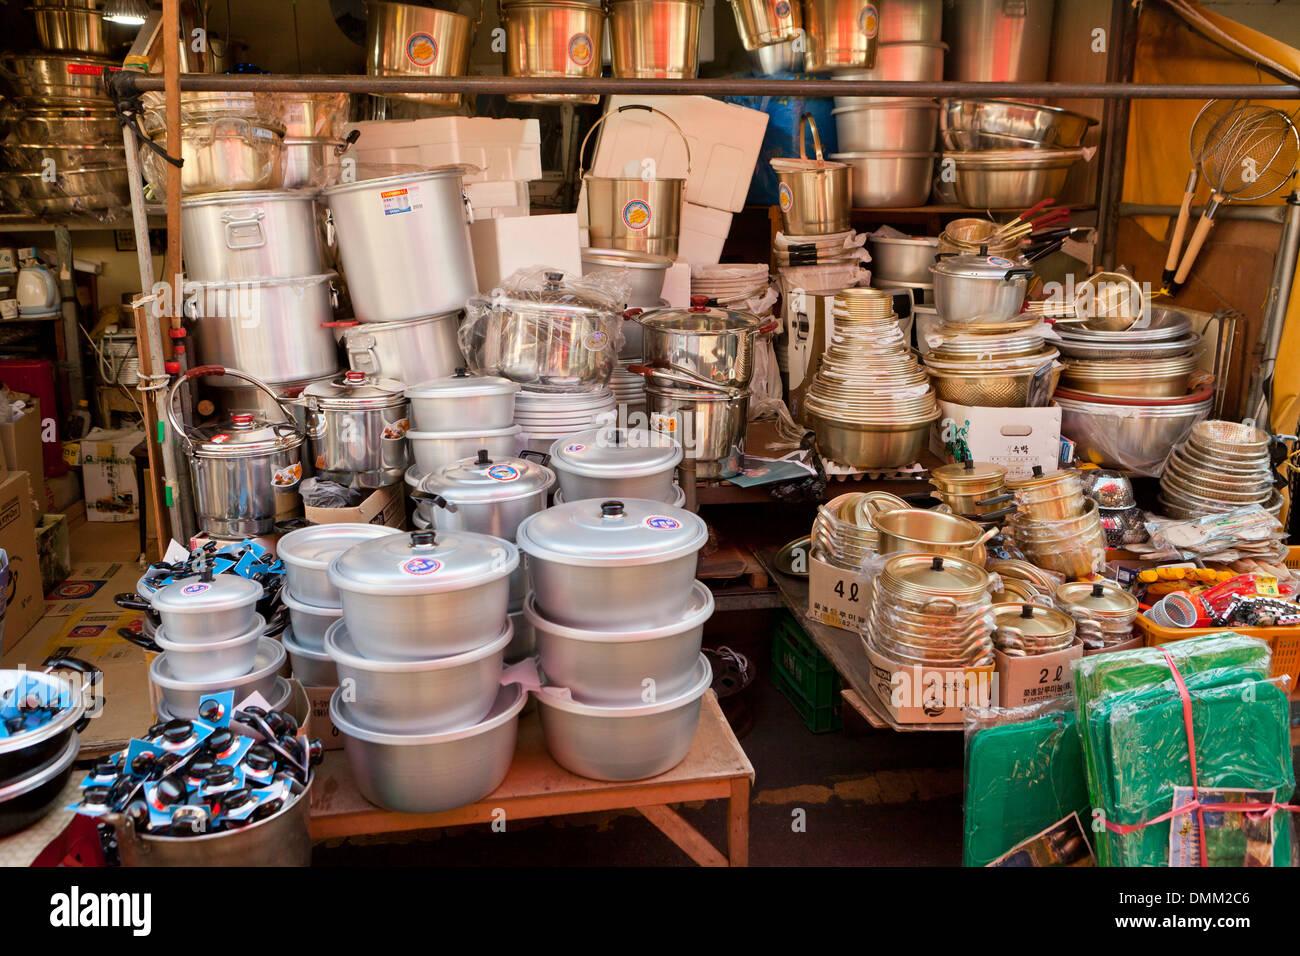 Cookware store at Jagalchi shijang (traditional outdoor market) - Busan, South Korea - Stock Image